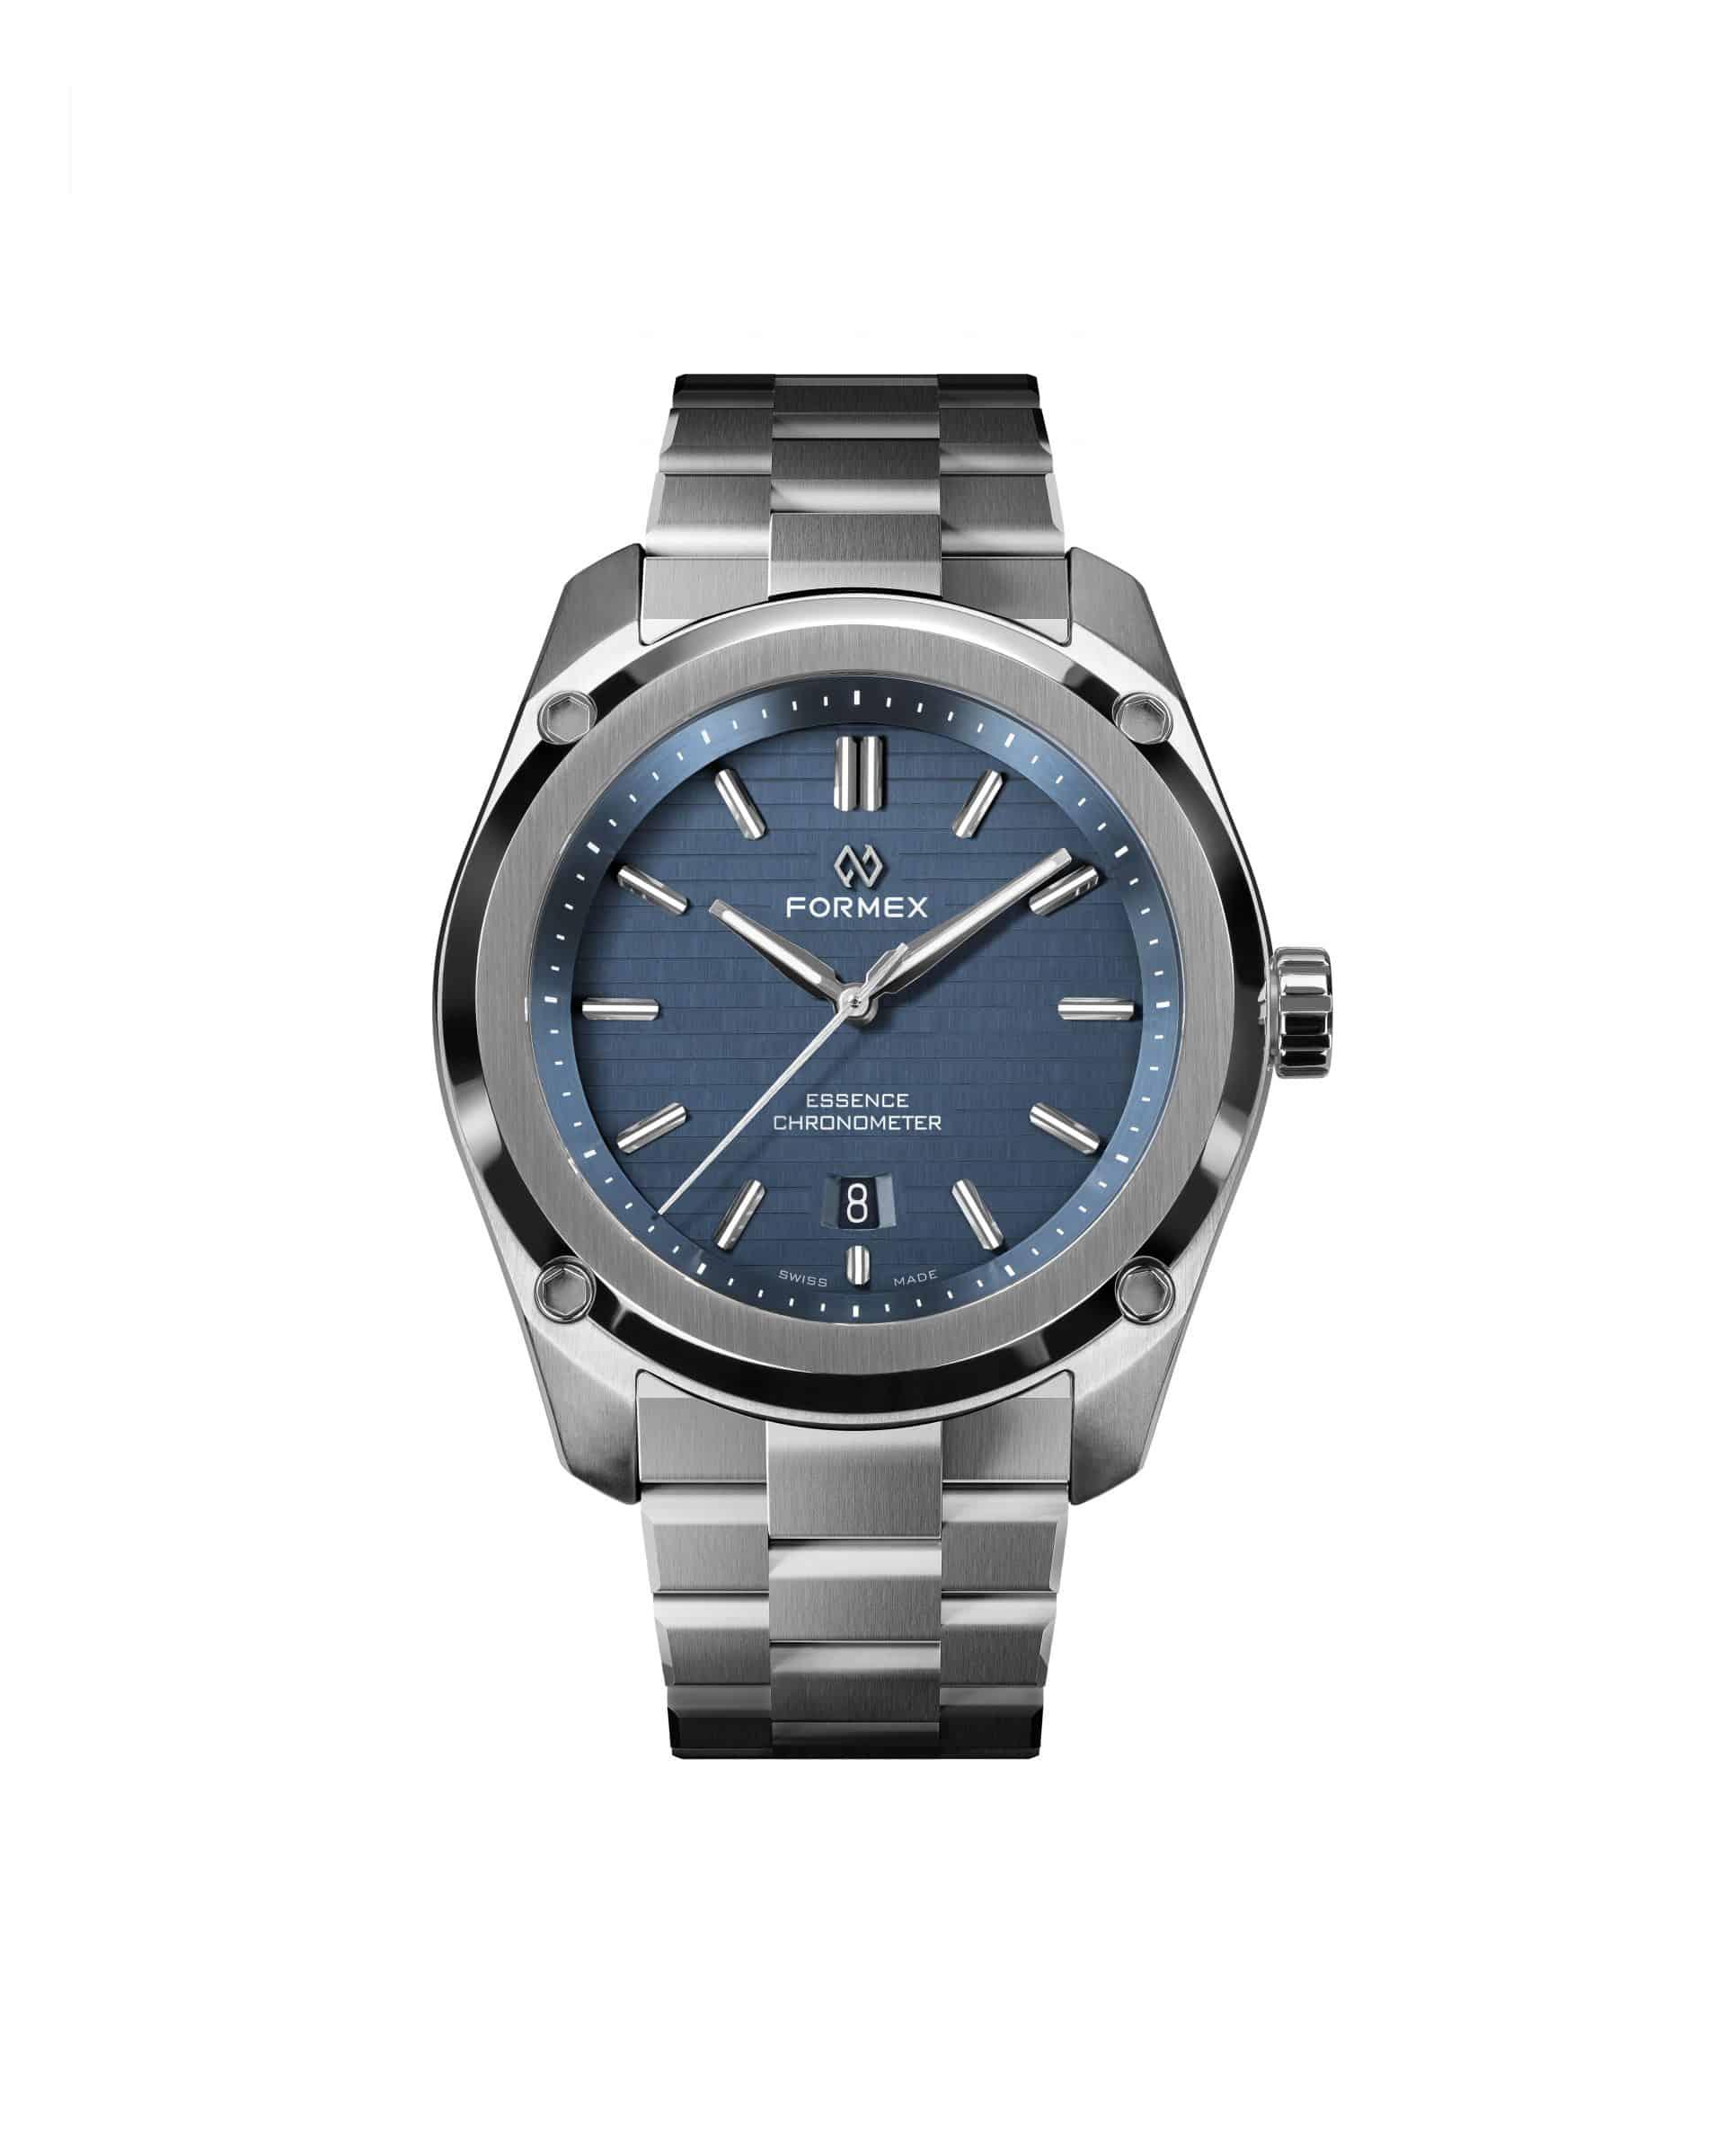 In Blau mit Stahlband - die Formex Essence Thirtynine 0333.1.6631.100